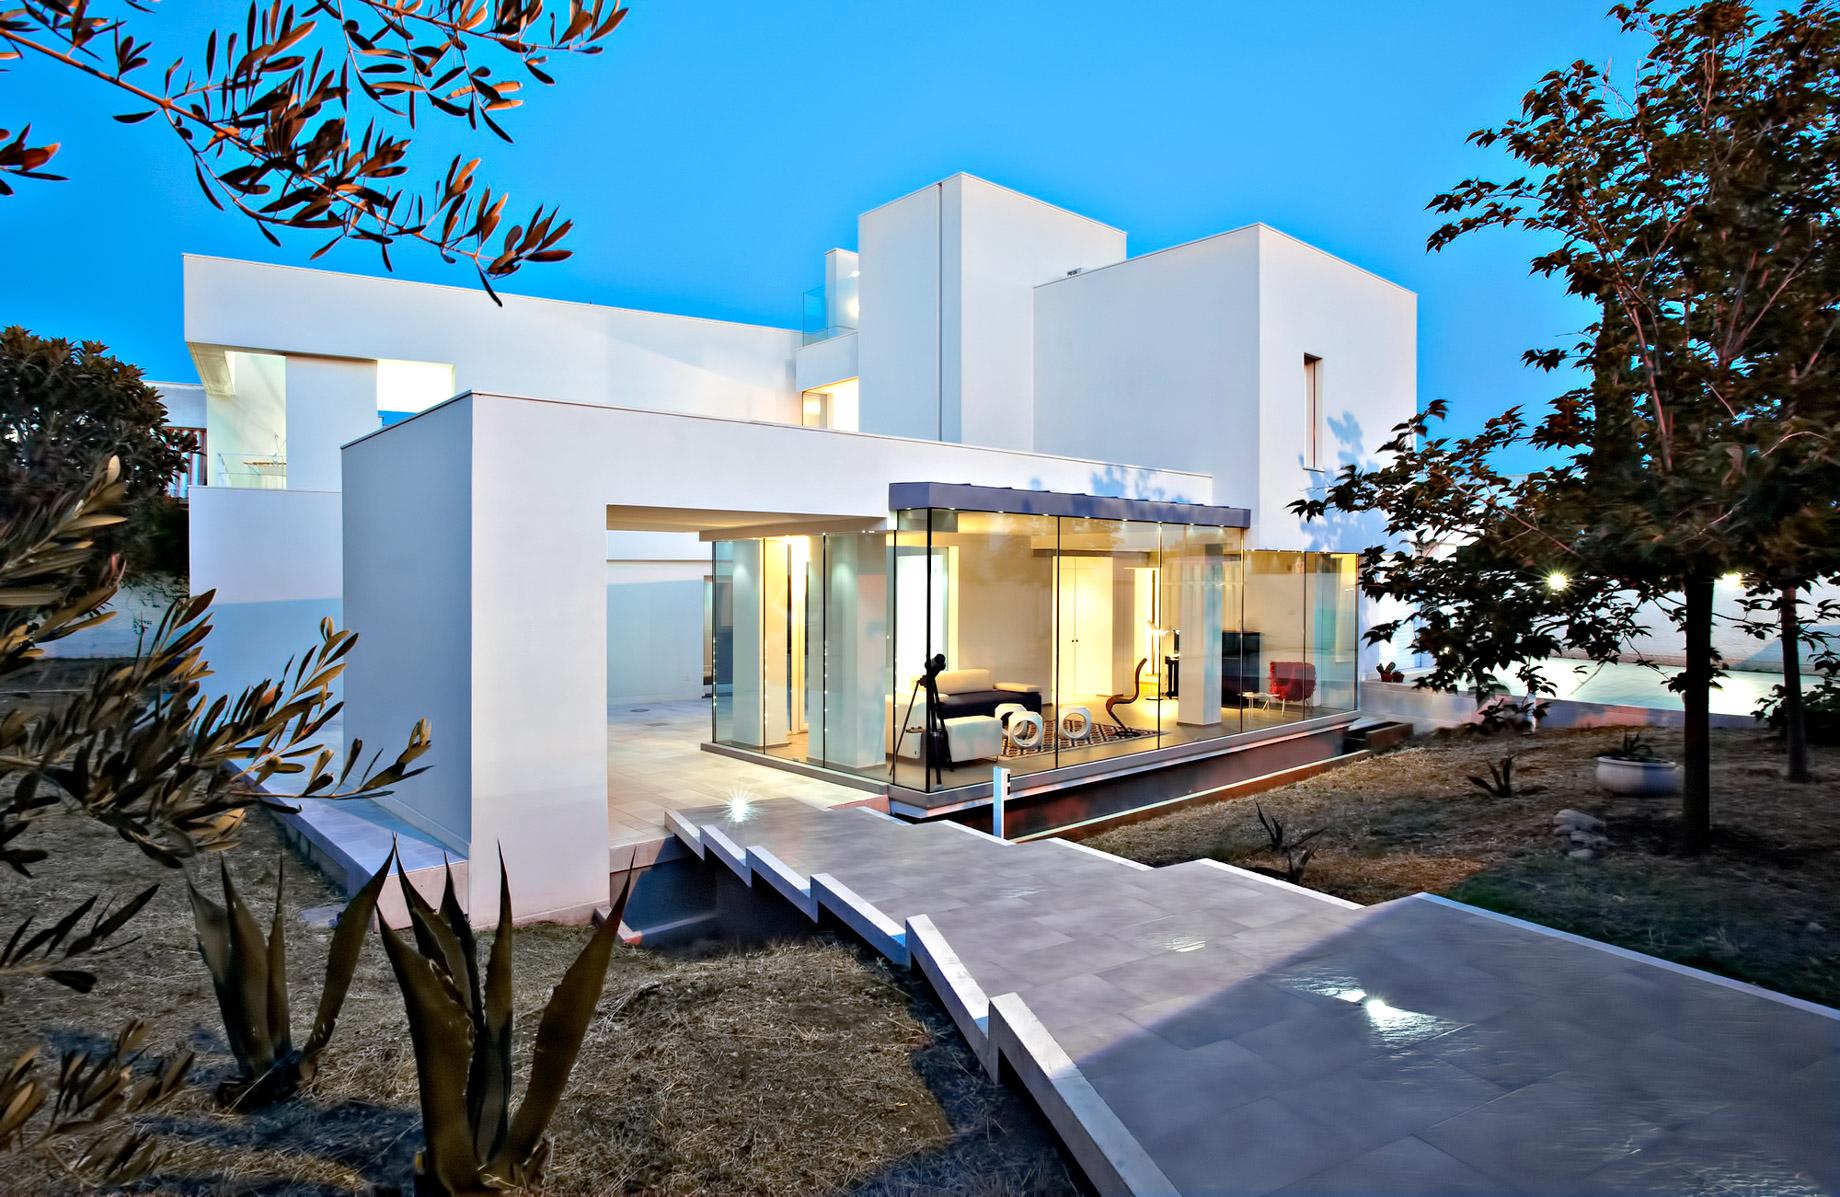 Bisceglie, Apulia, Barletta-Andria-Trani, Italy 🇮🇹 – Luxury Properties – Showcase